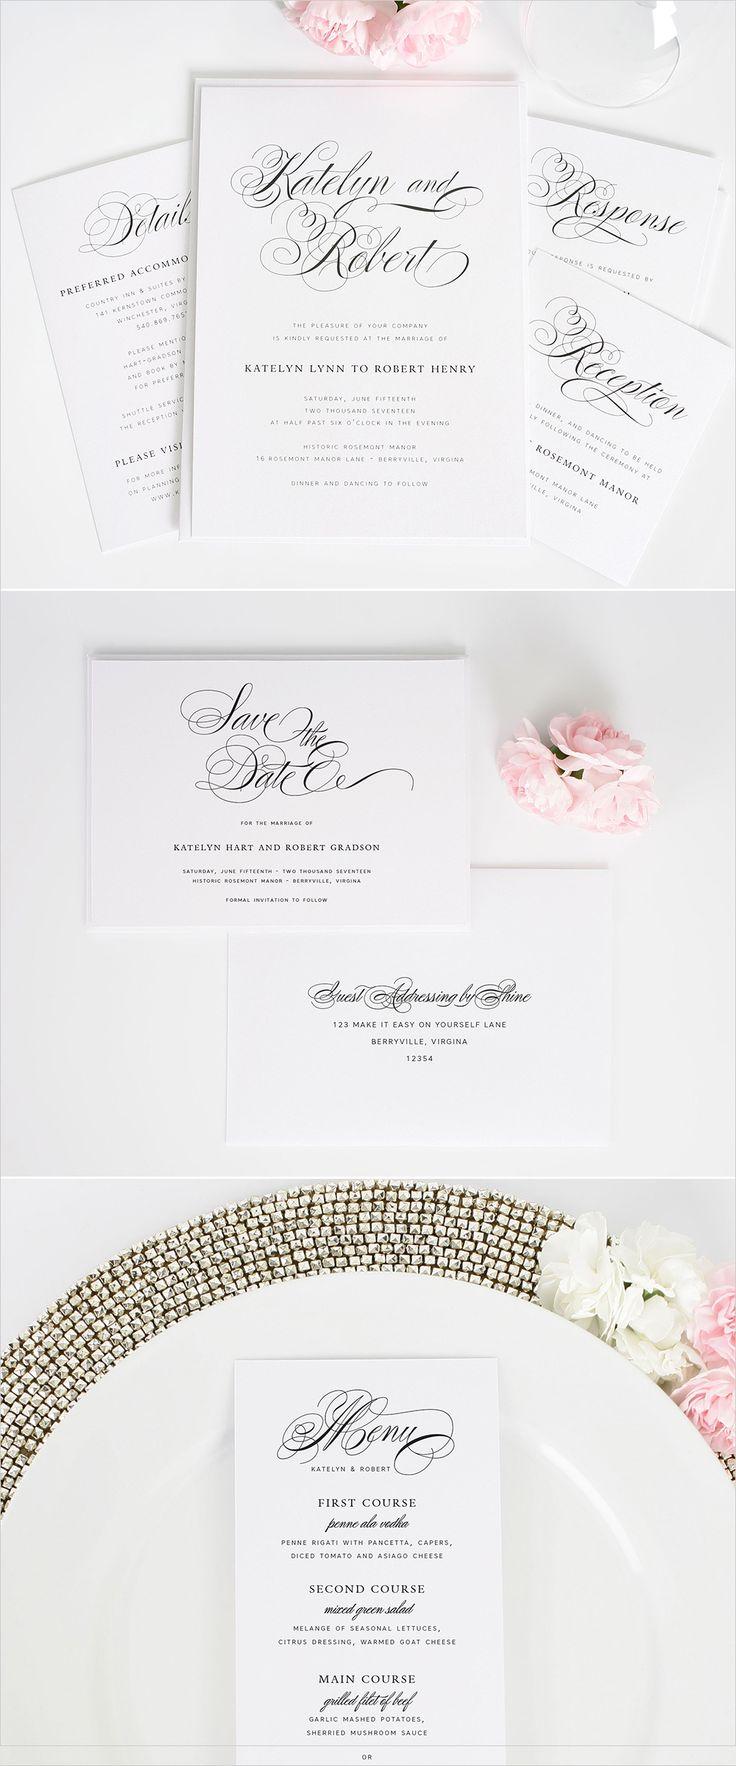 Southern script wedding invitations